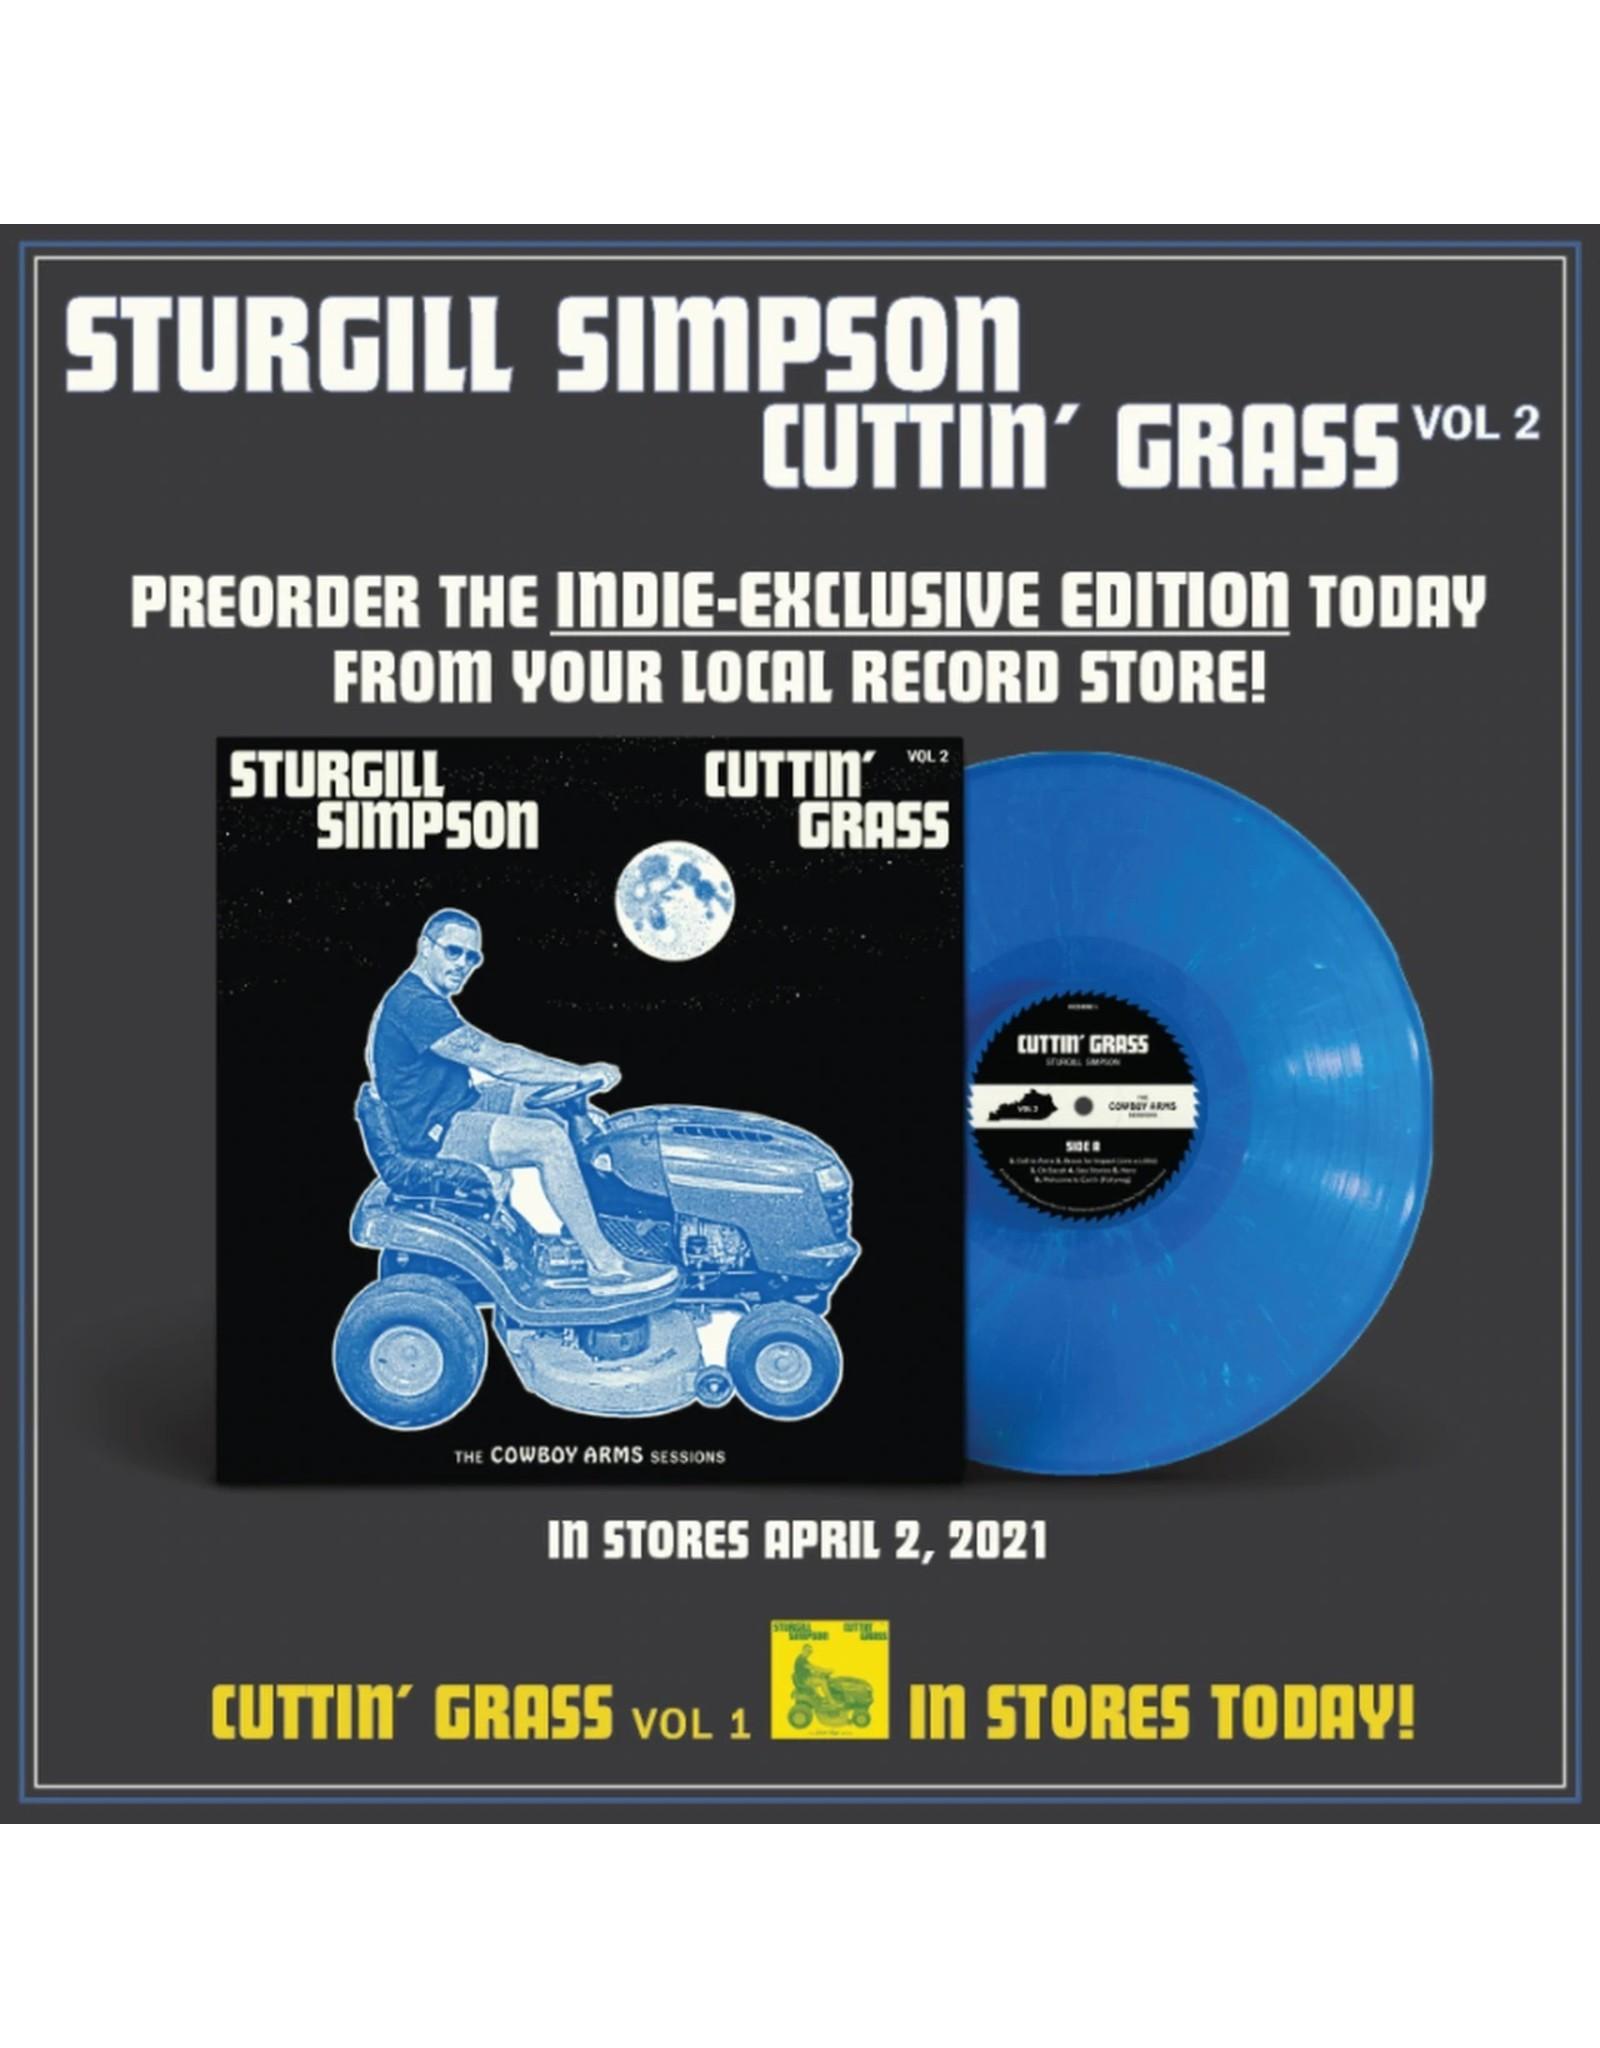 Sturgill Simpson - Cuttin' Grass Vol. 2 (Exclusive Blue Vinyl)